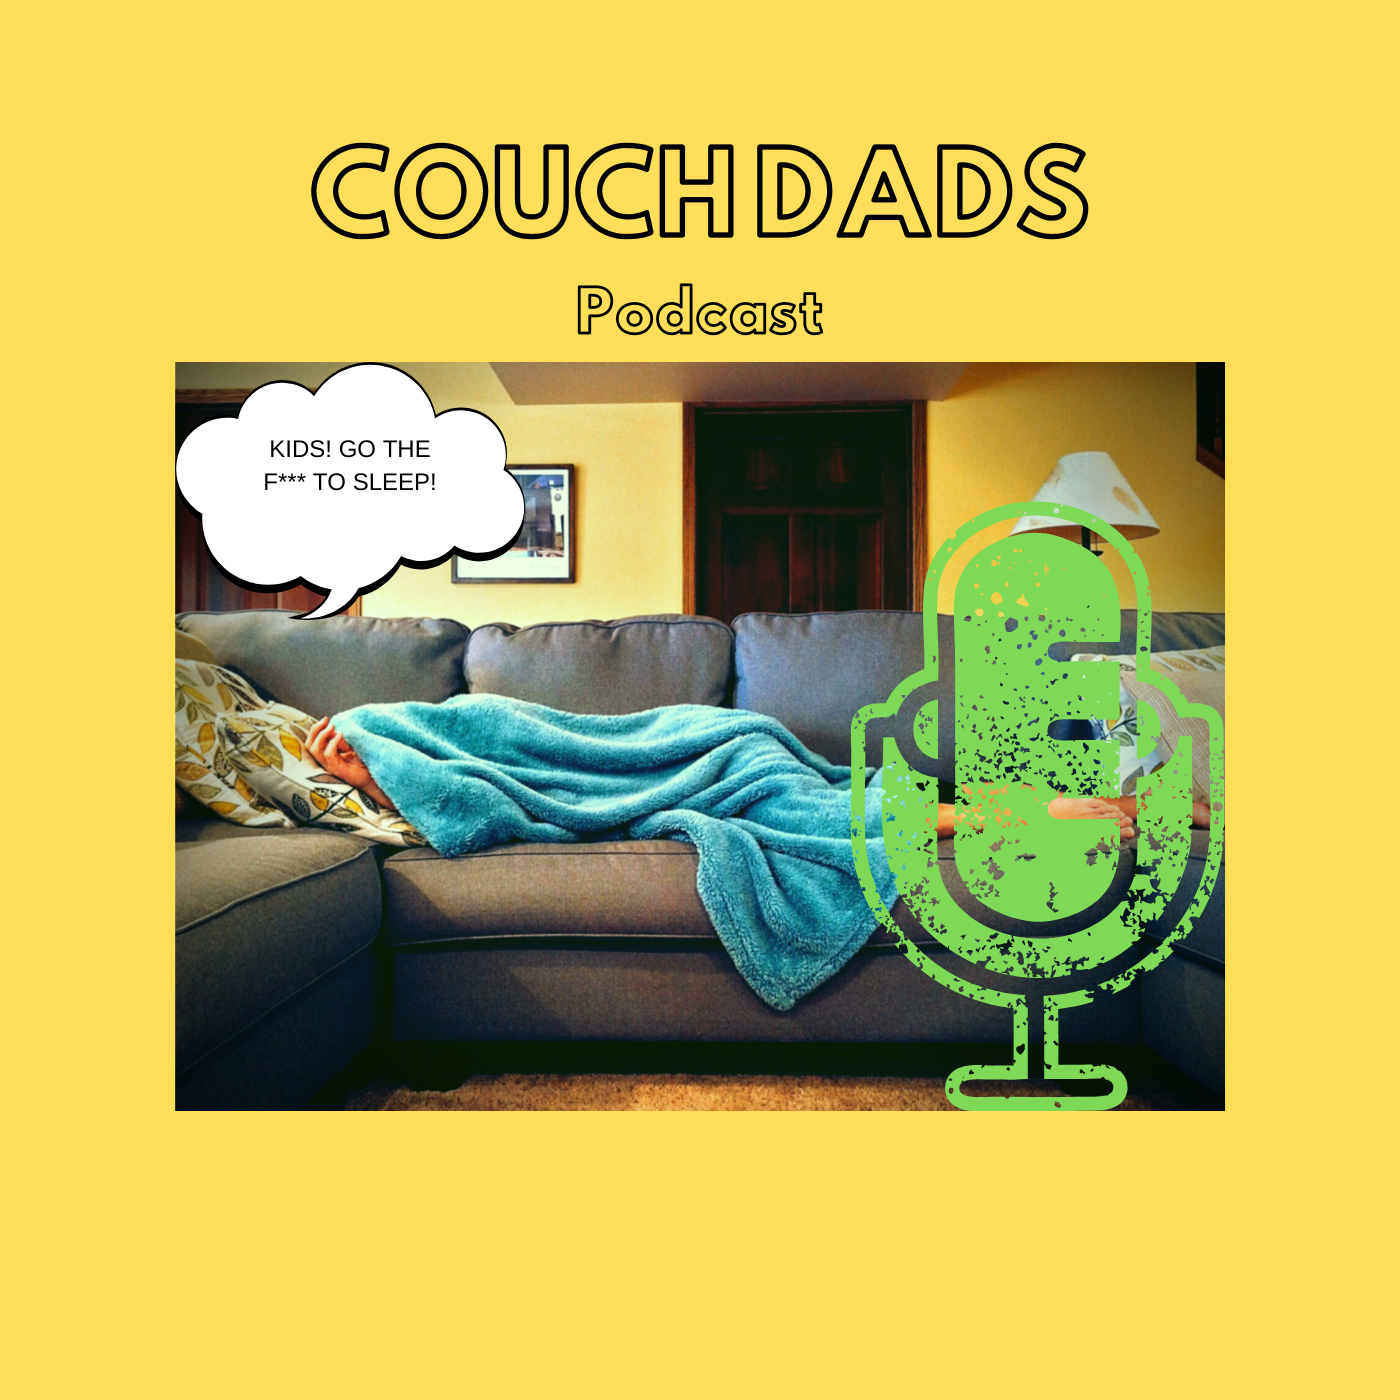 CouchDads